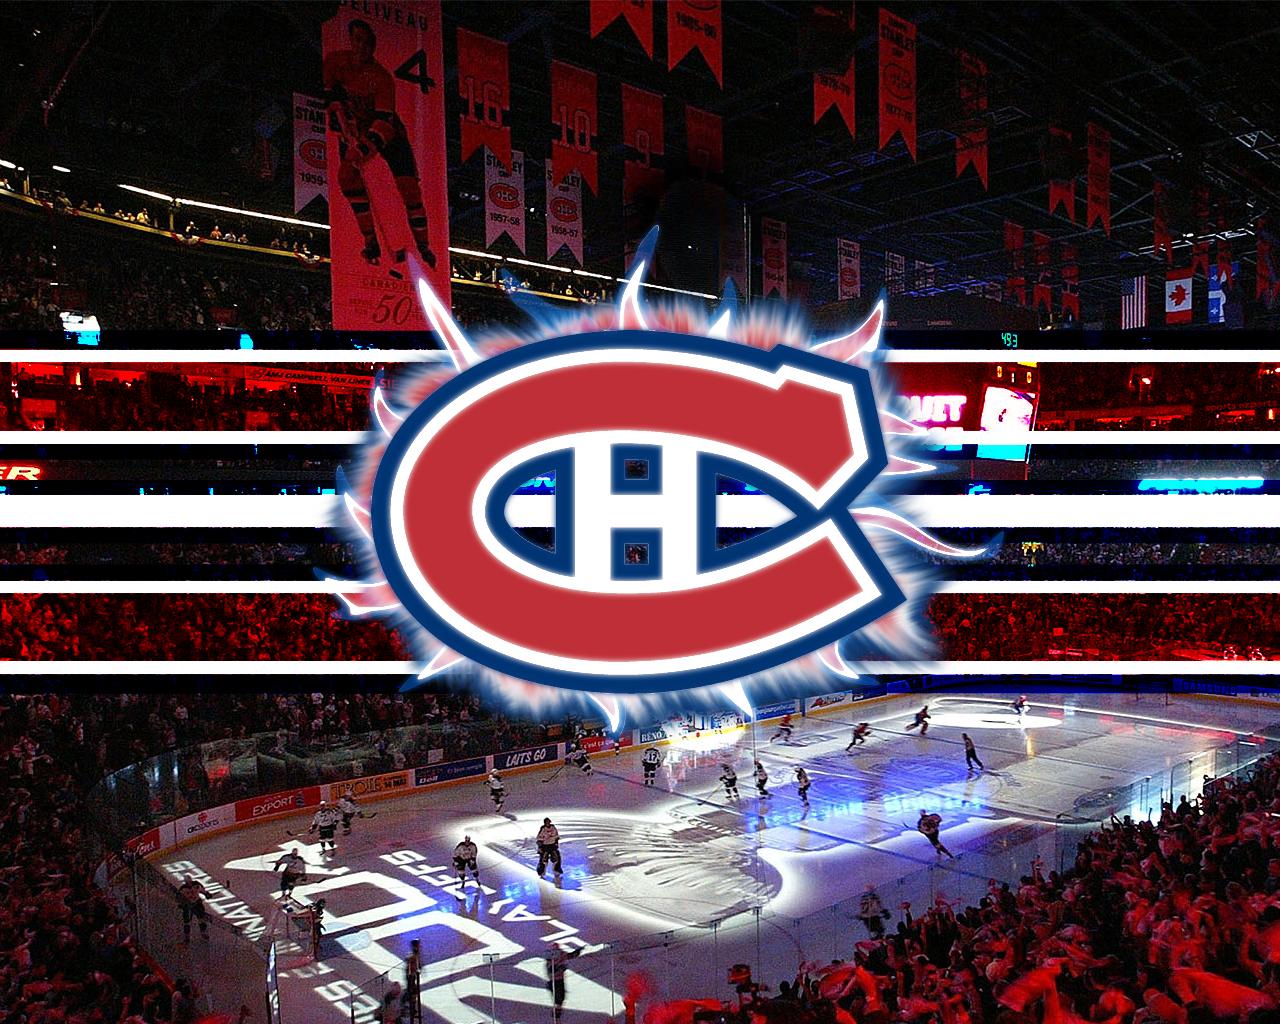 Carey price wallpapers montreal habs montreal hockey 9 html code - Montreal Canadiens Montreal Canadiens 0 Html Code